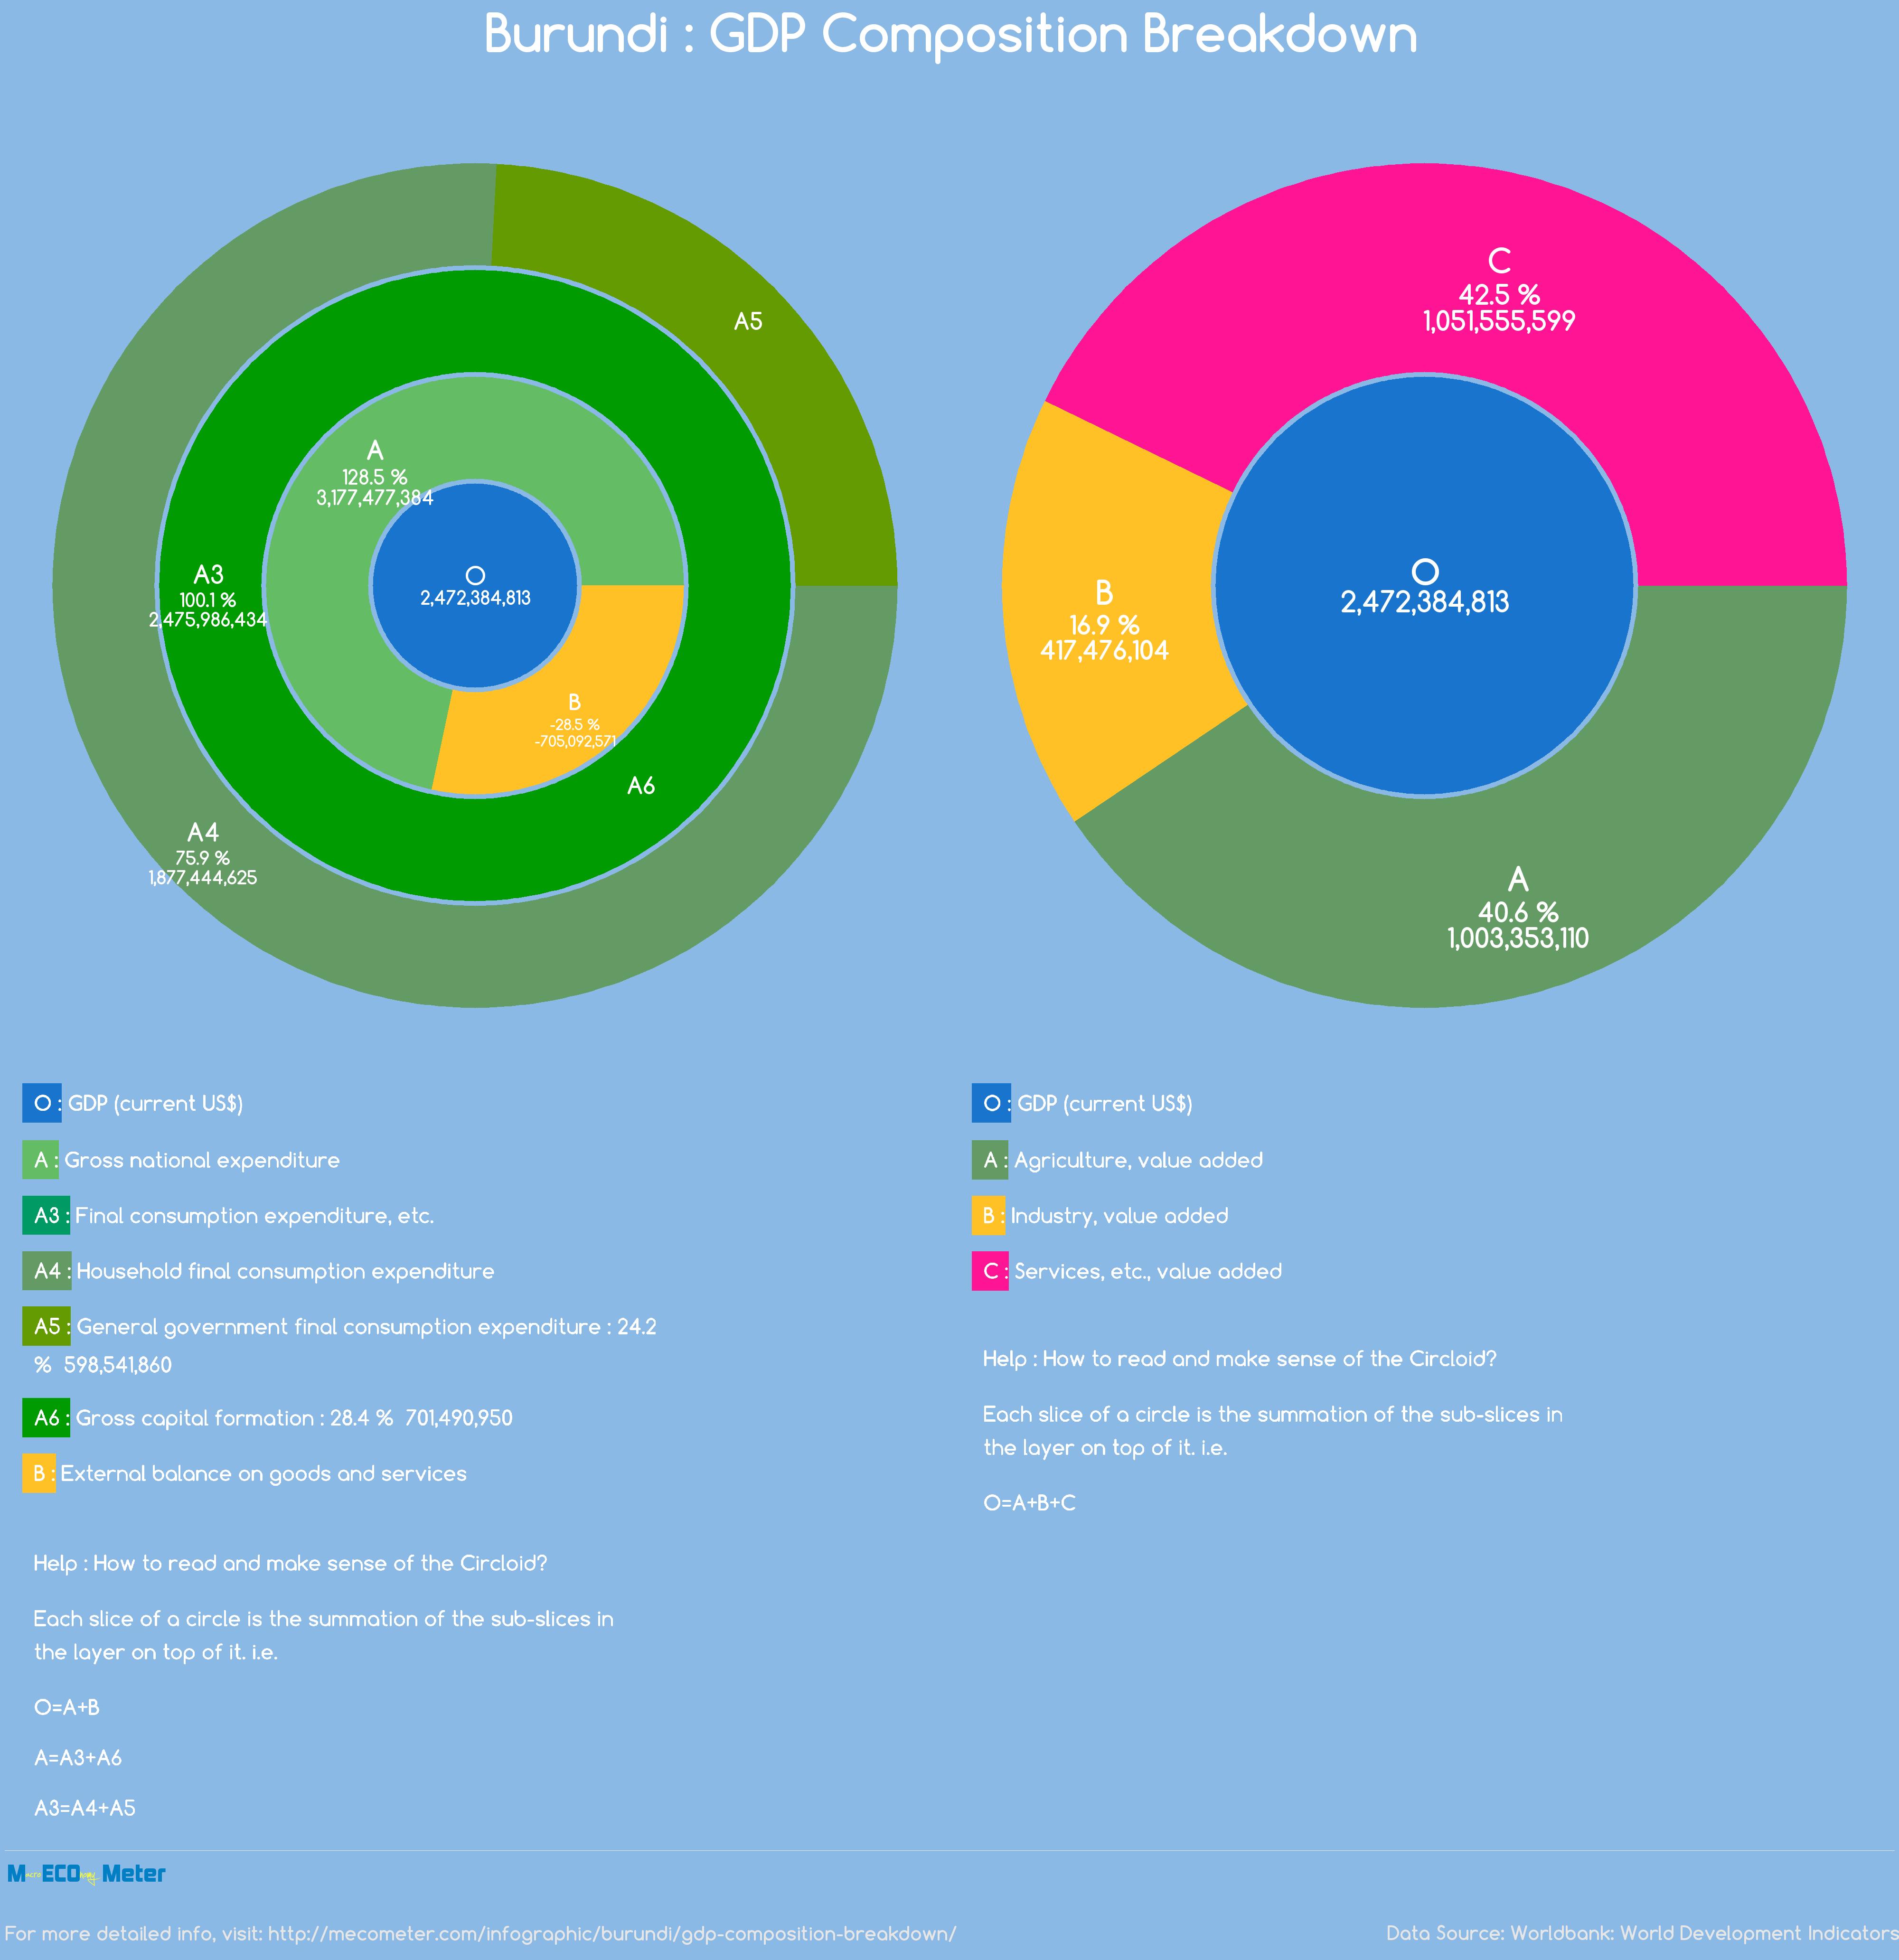 Burundi : GDP Composition Breakdown